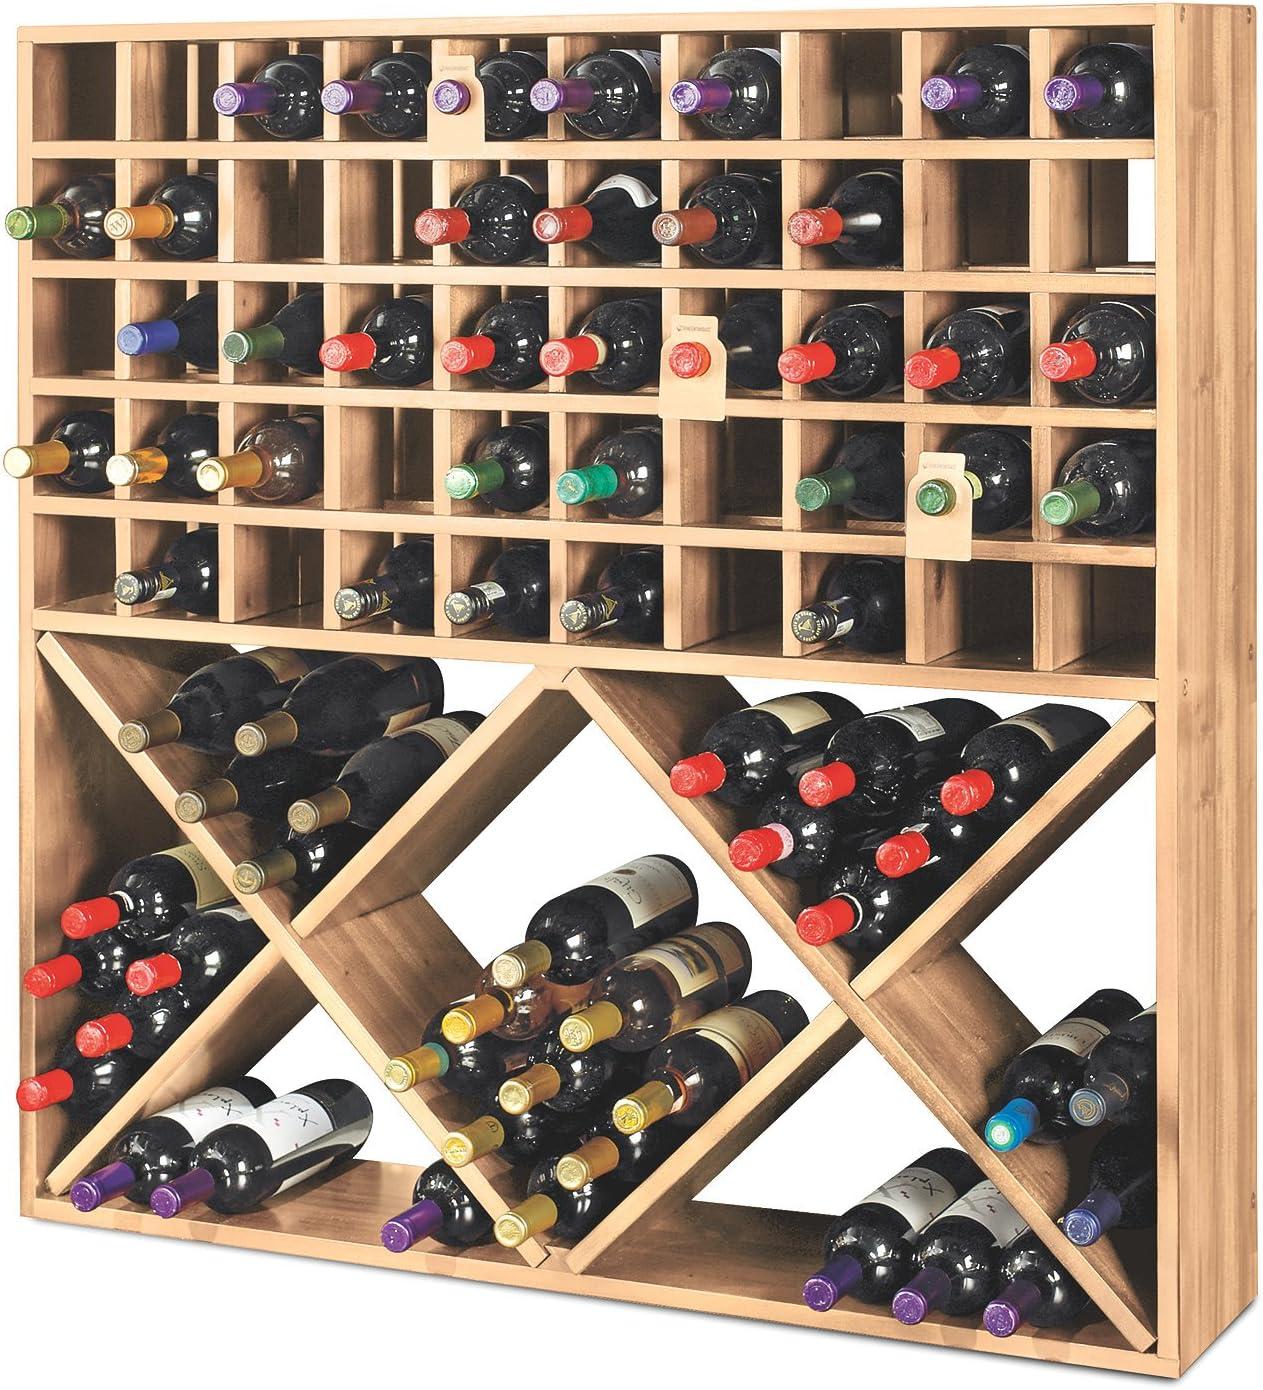 Jumbo Bin Grid 100 Bottle Wine Ranking Max 60% OFF TOP8 Unstained - Rack